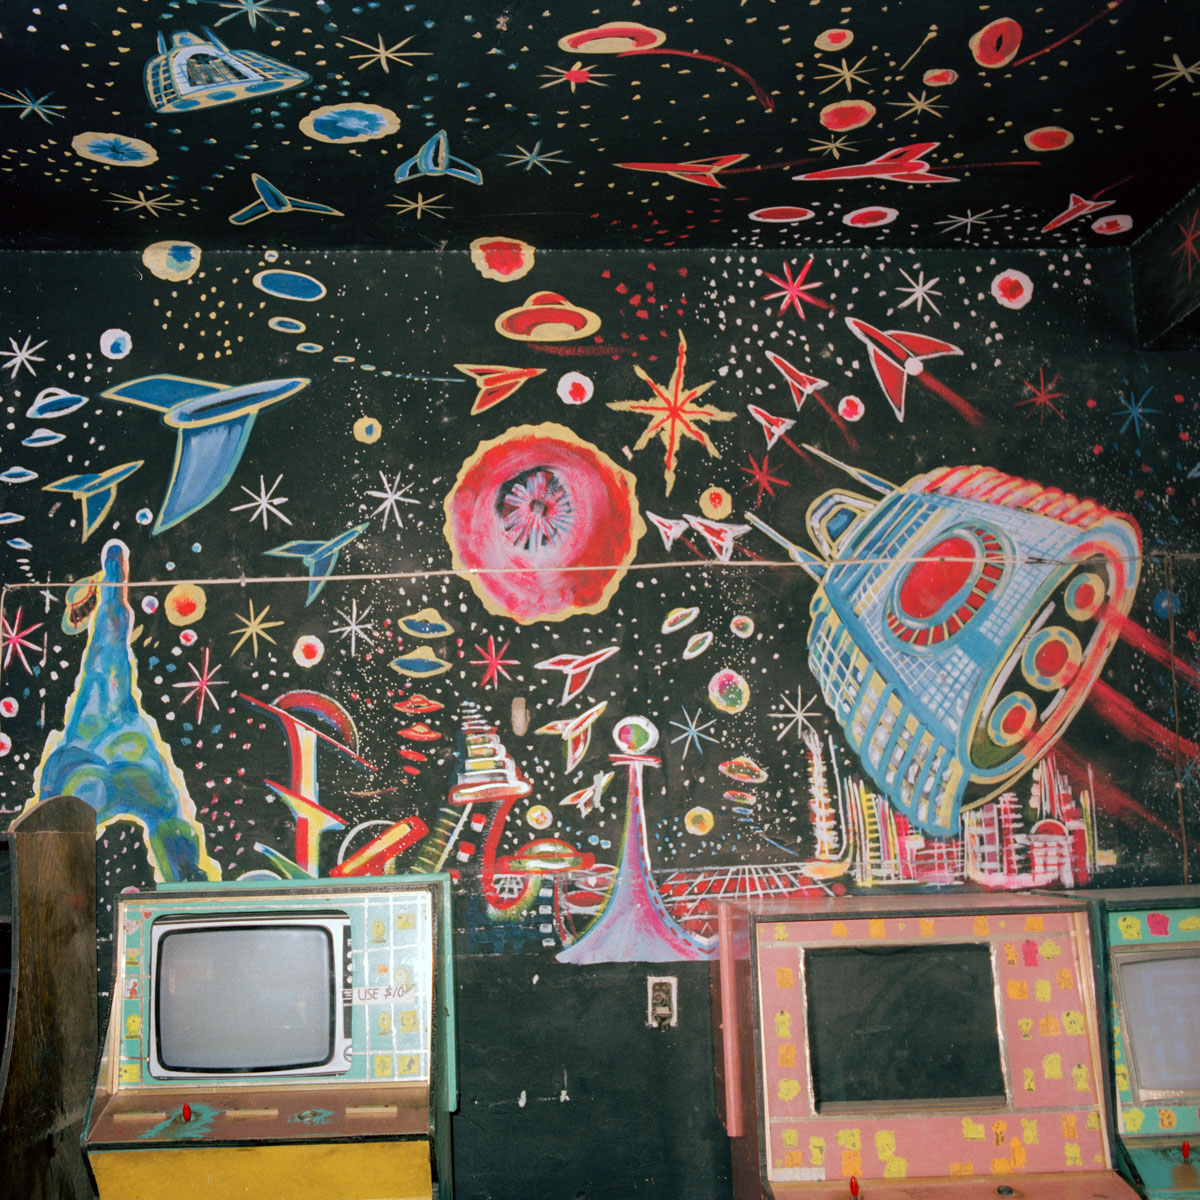 Games Arcade, Juchitán, Oaxaca, México 1986